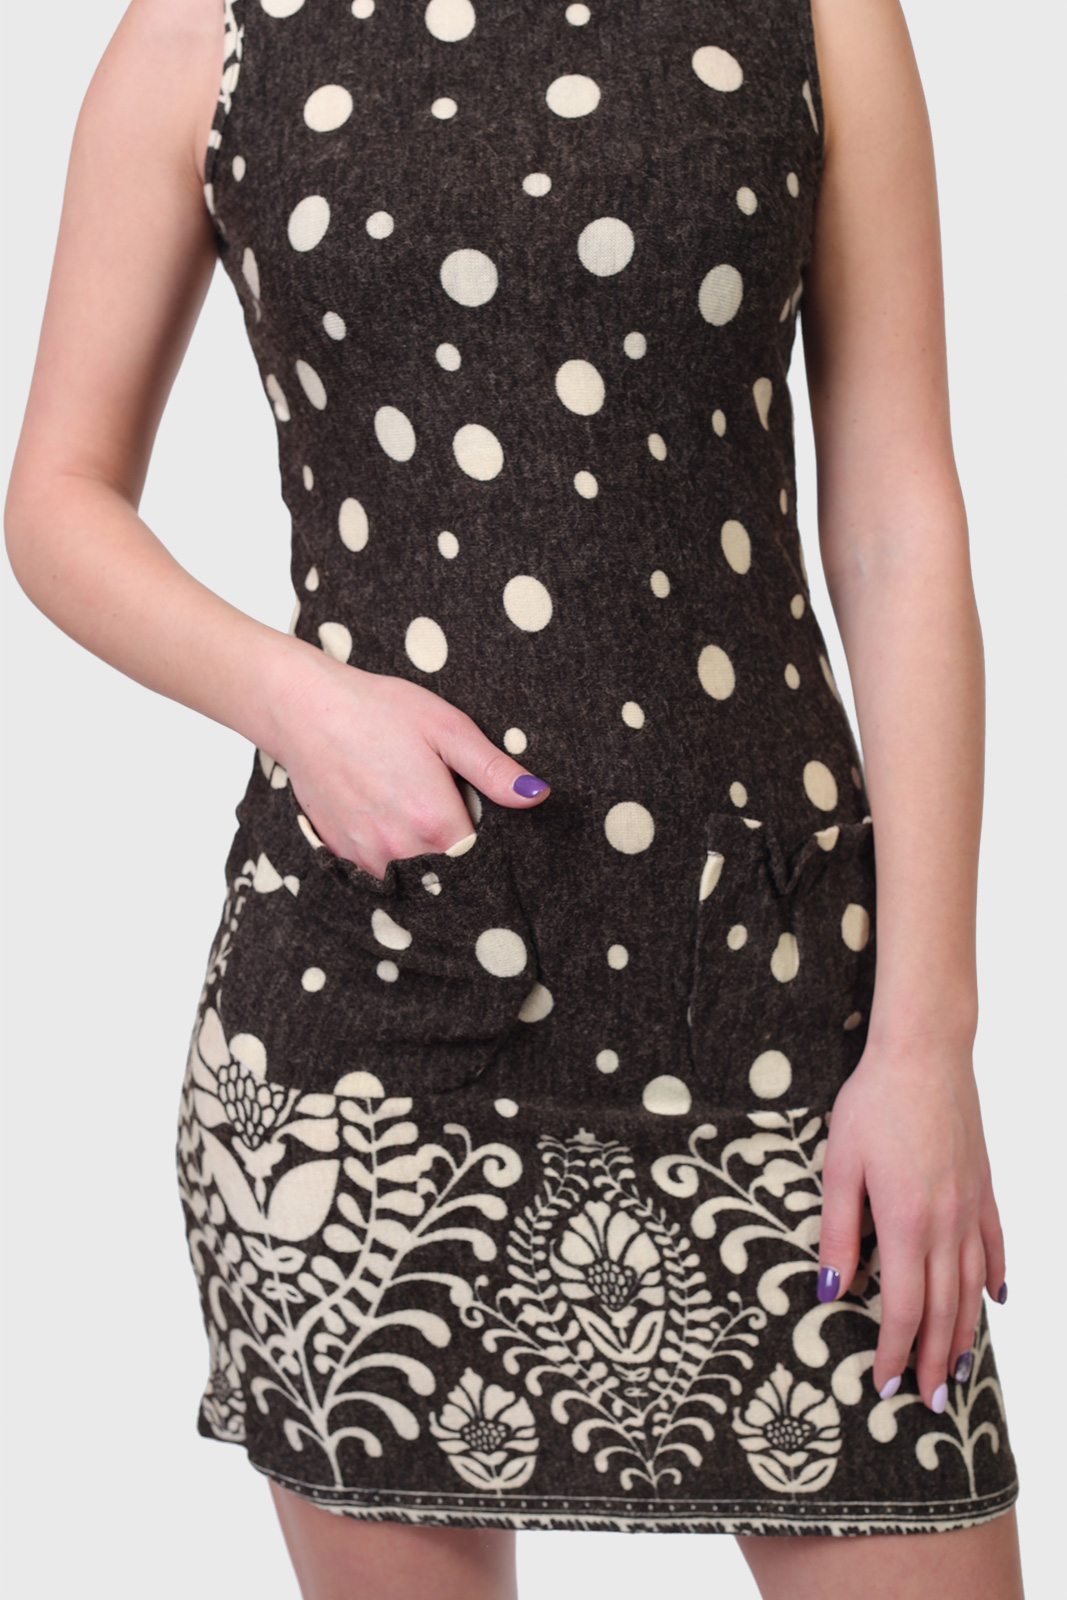 Стройнящее платье-карандаш Freeday.